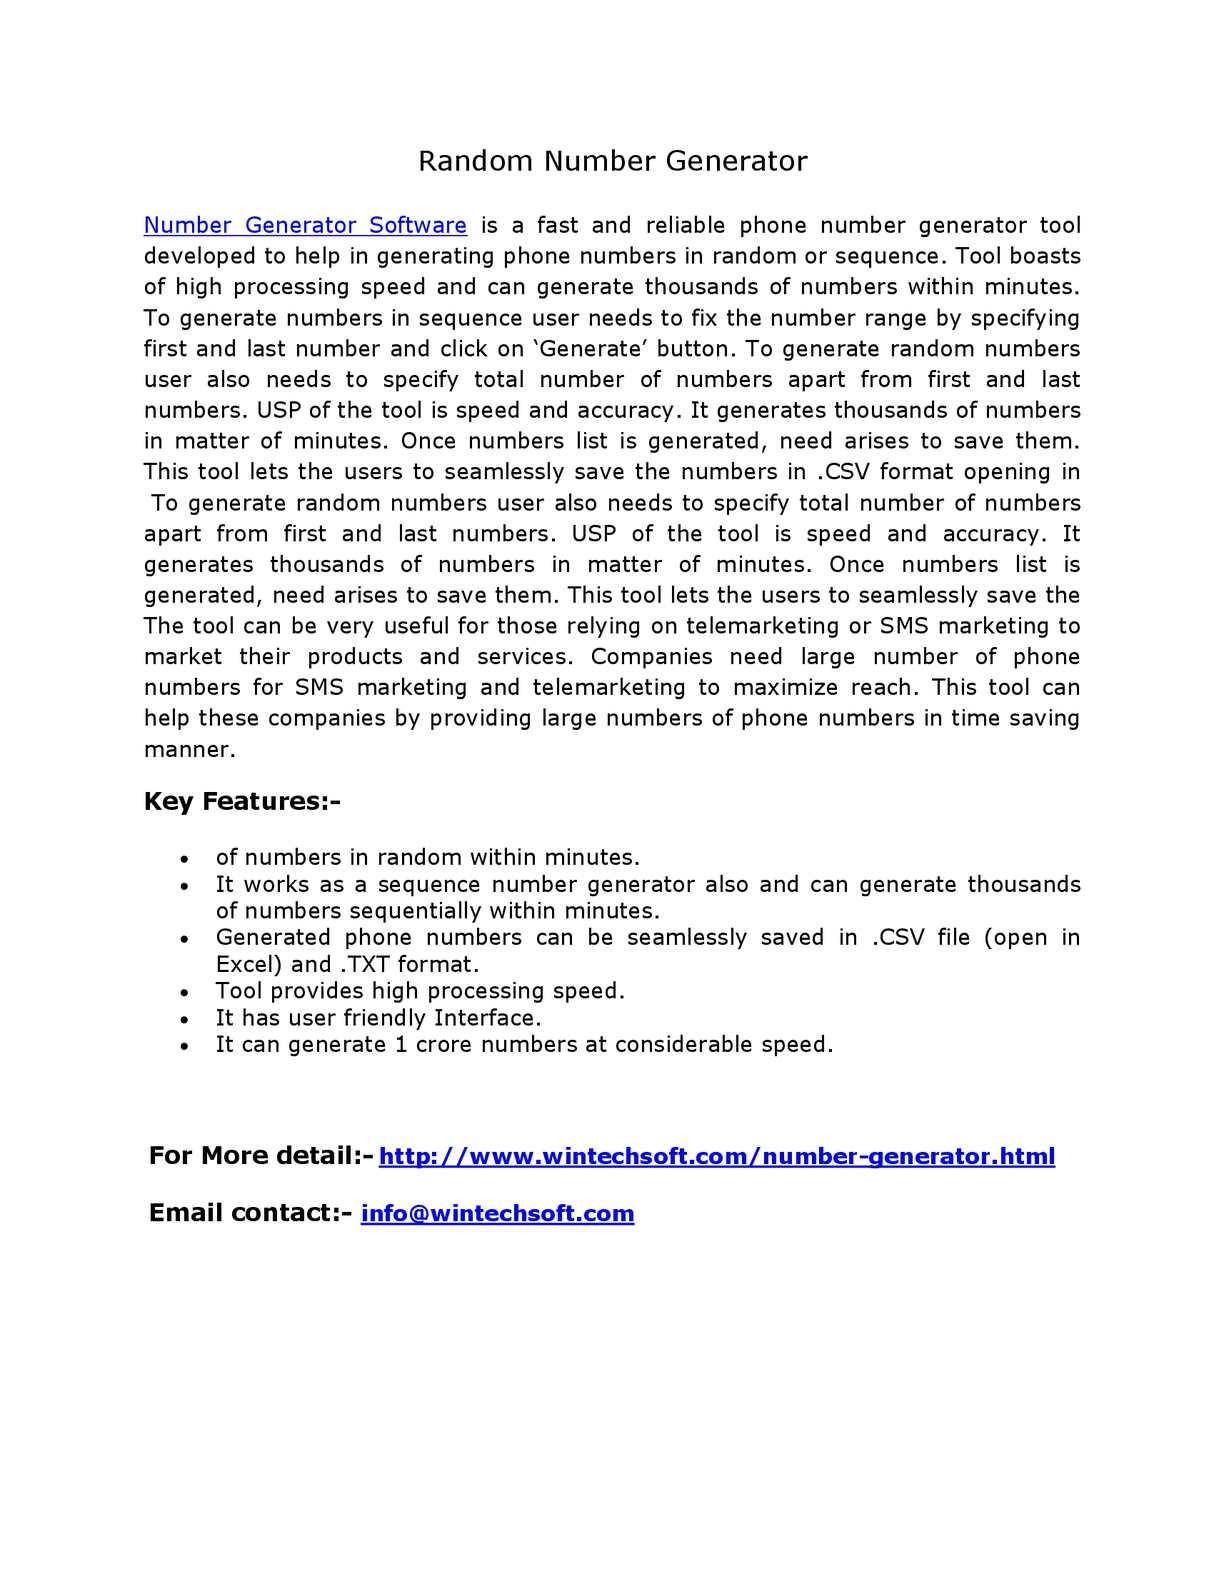 Calaméo - Random number generator wintechsoft